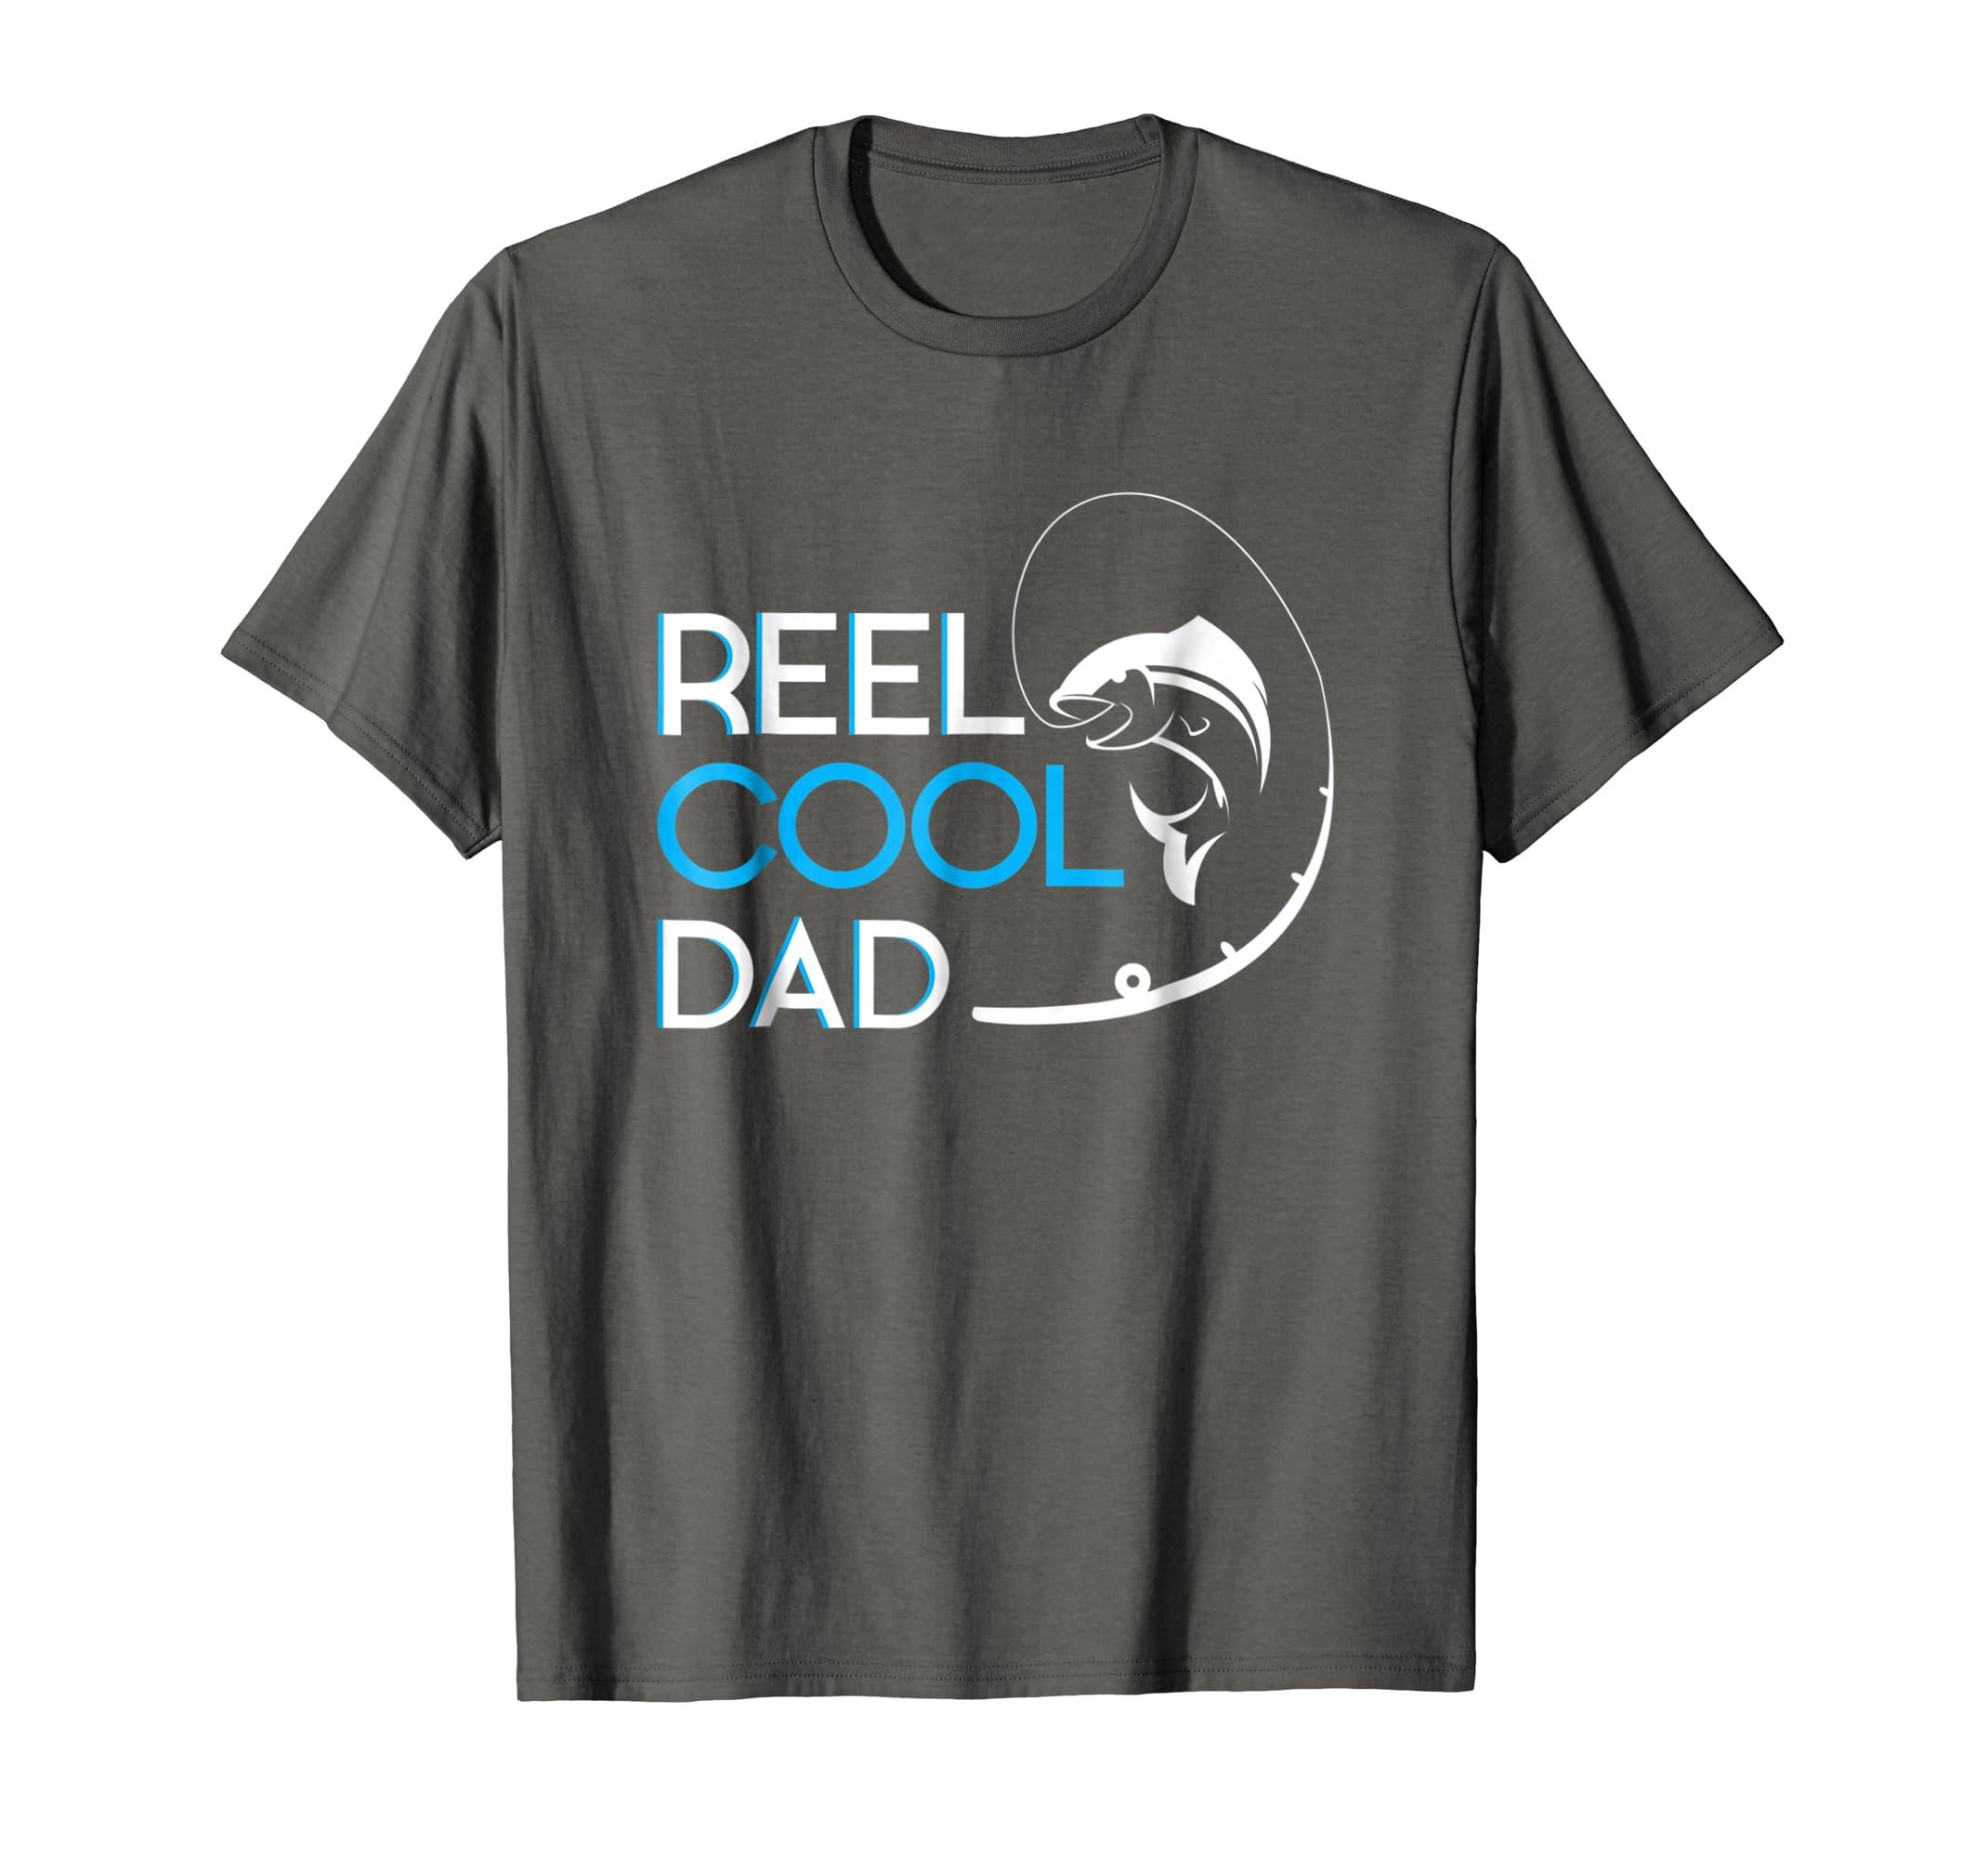 9f321a55 Amazon.com: Reel Cool Dad T-Shirt: Clothing